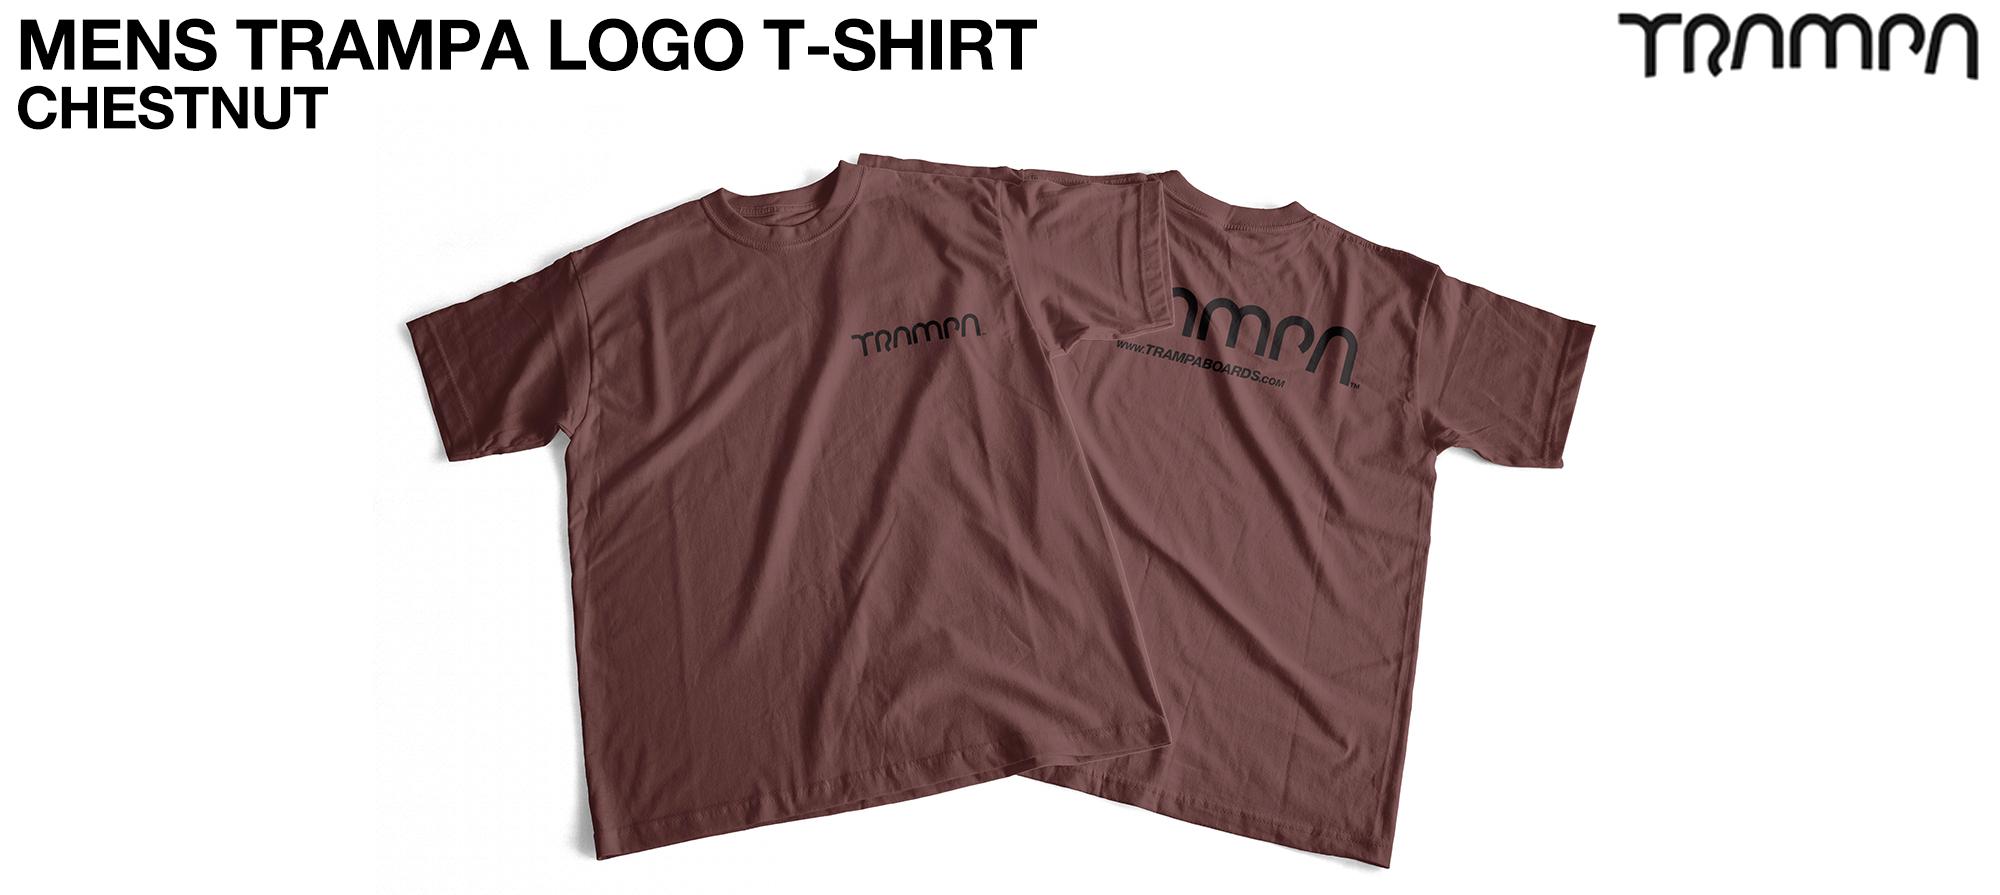 Gildan TRAMPA T shirt Chestnut - CUSTOM